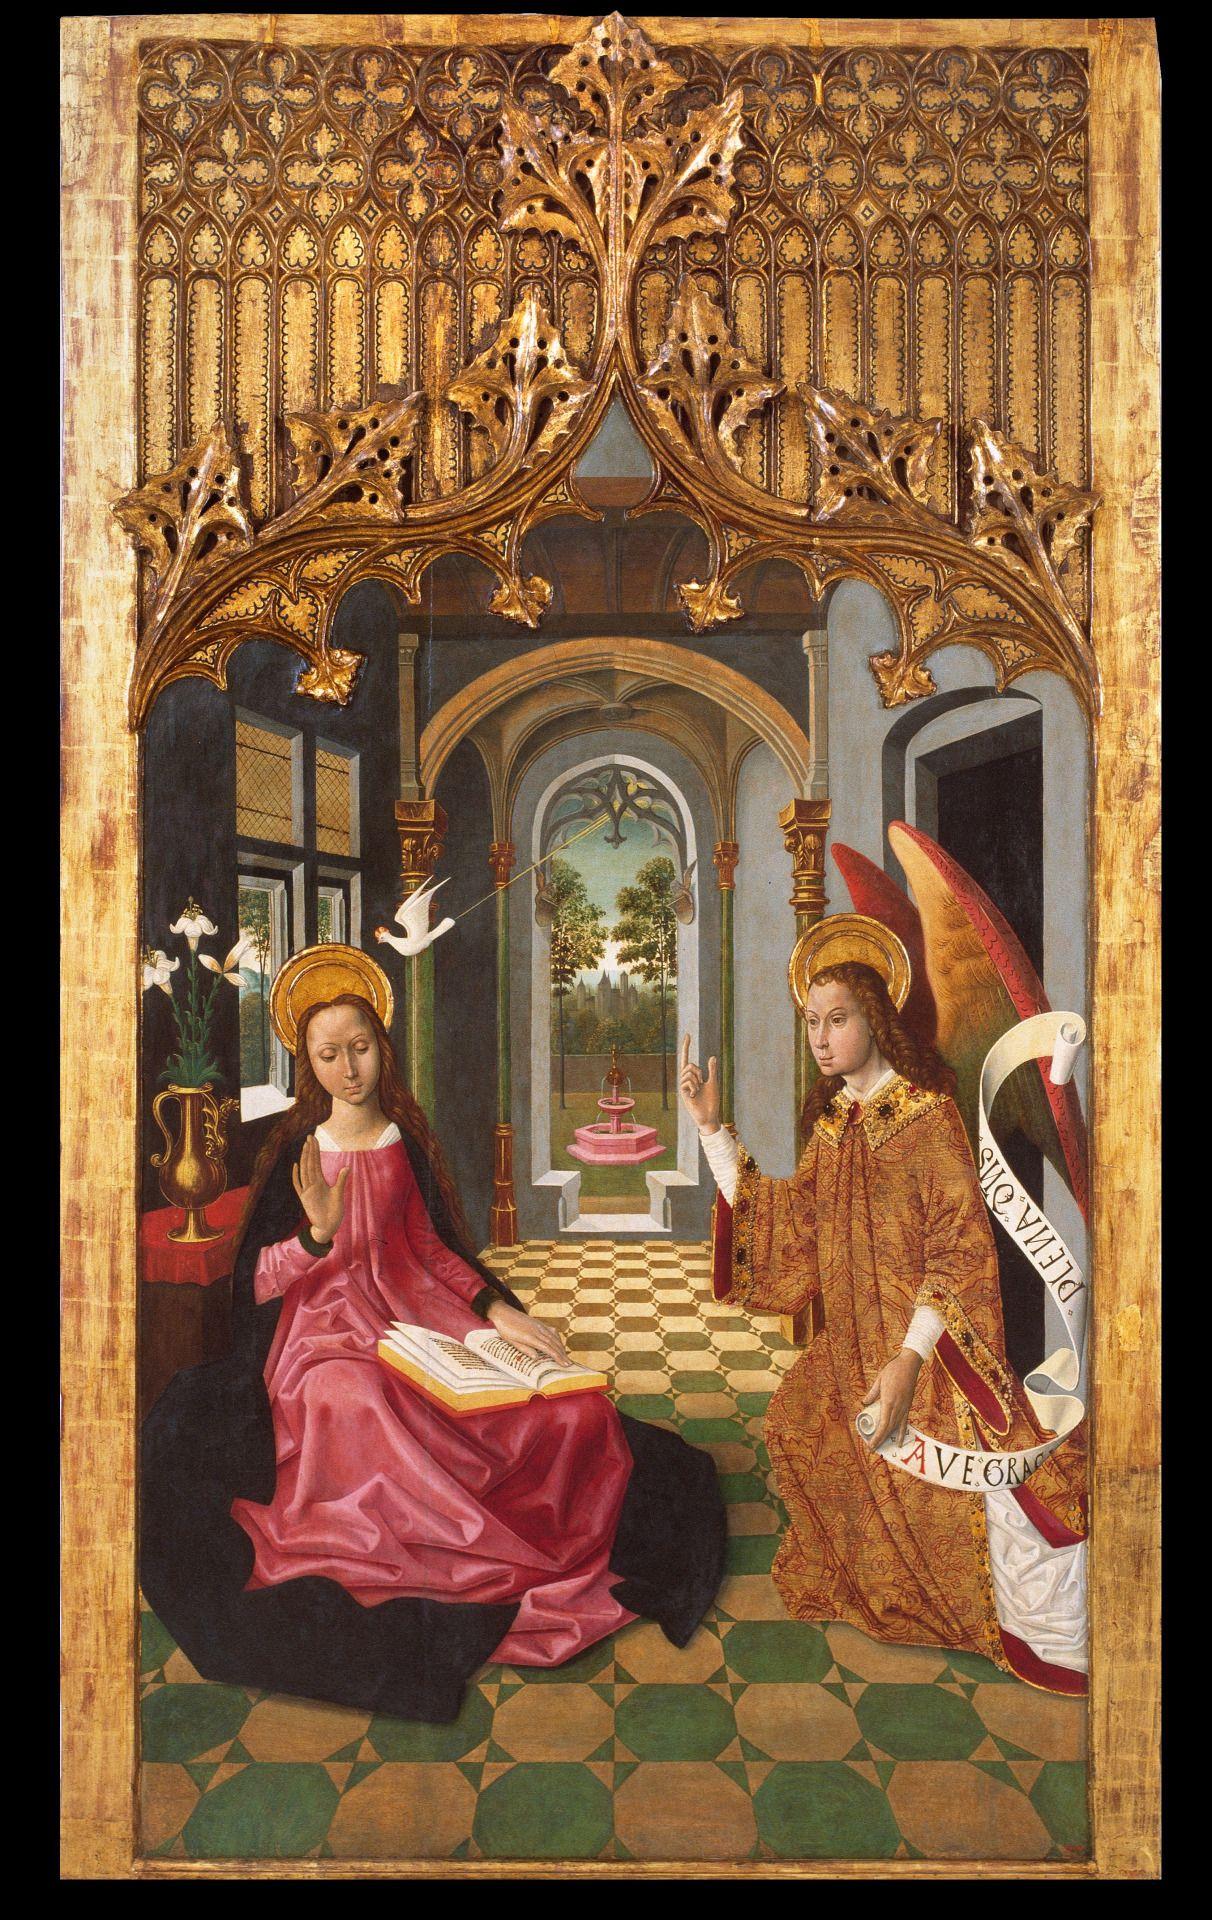 Master of La Seu d'Urgell - The Annunciation. 1495